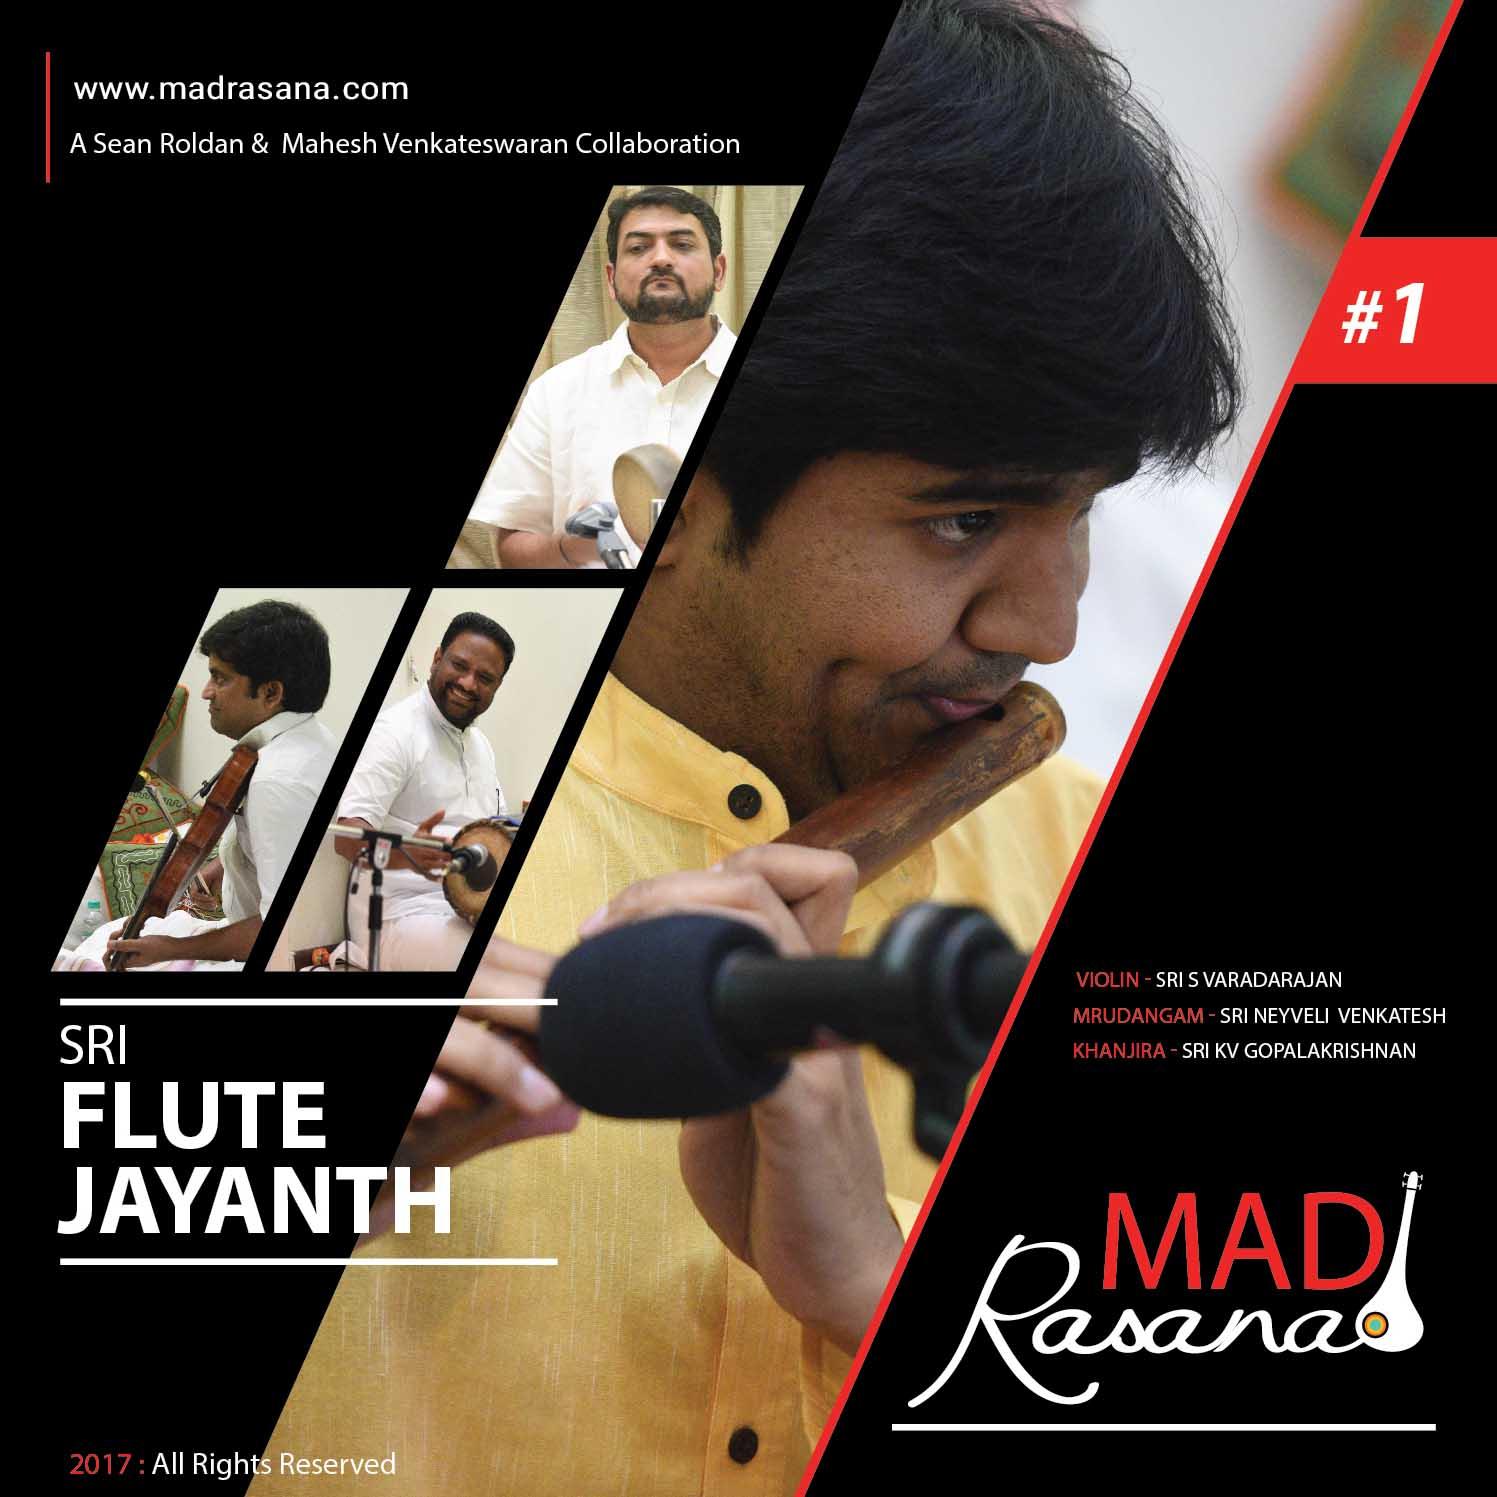 Flute Jayanth